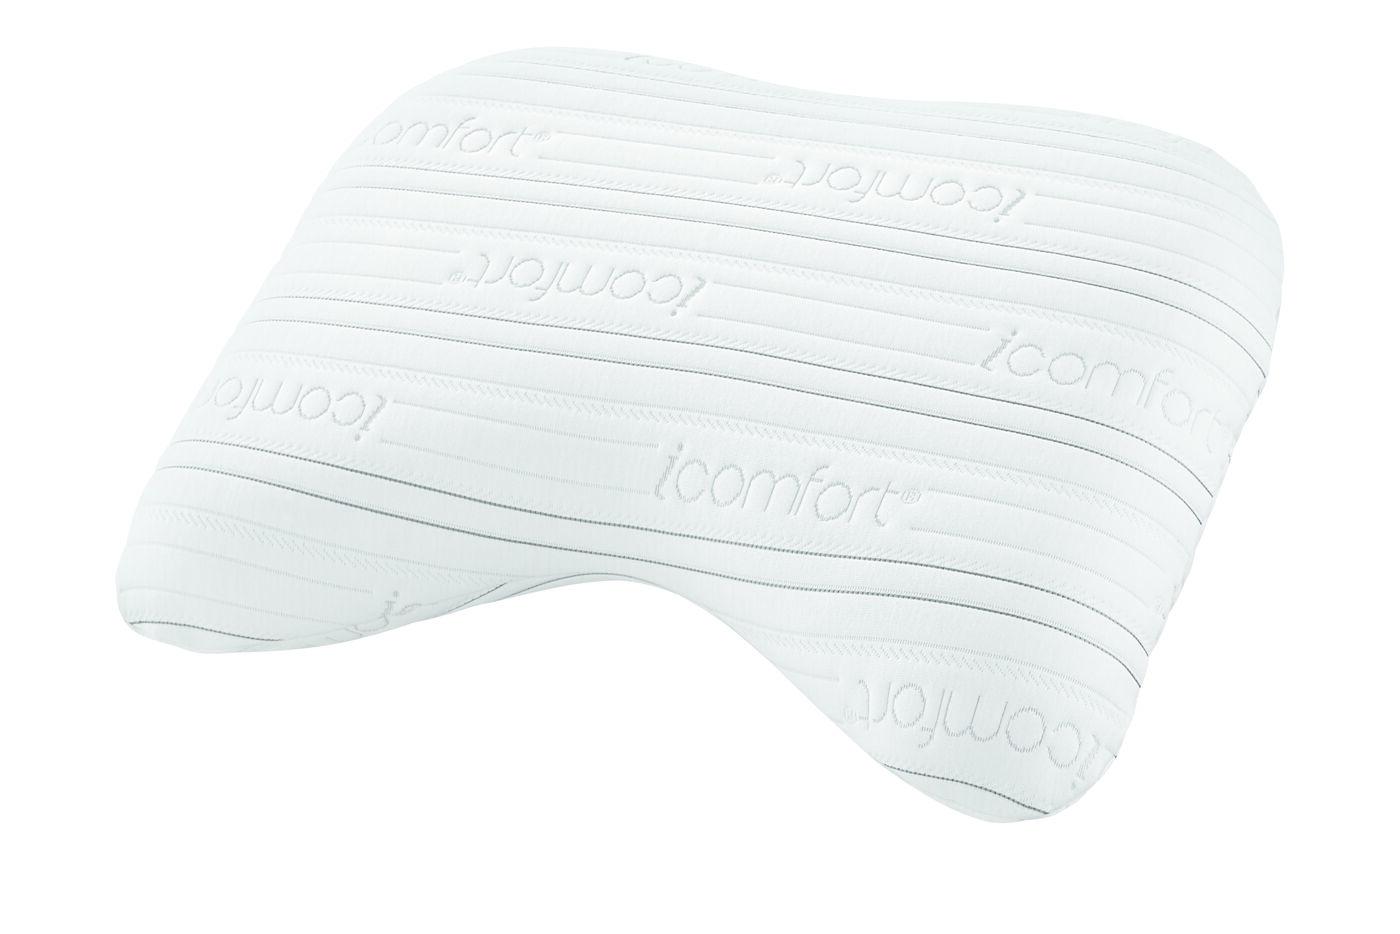 kitchen dp layer comfort triple foam pillow plush amazon home memory serta sertarest com